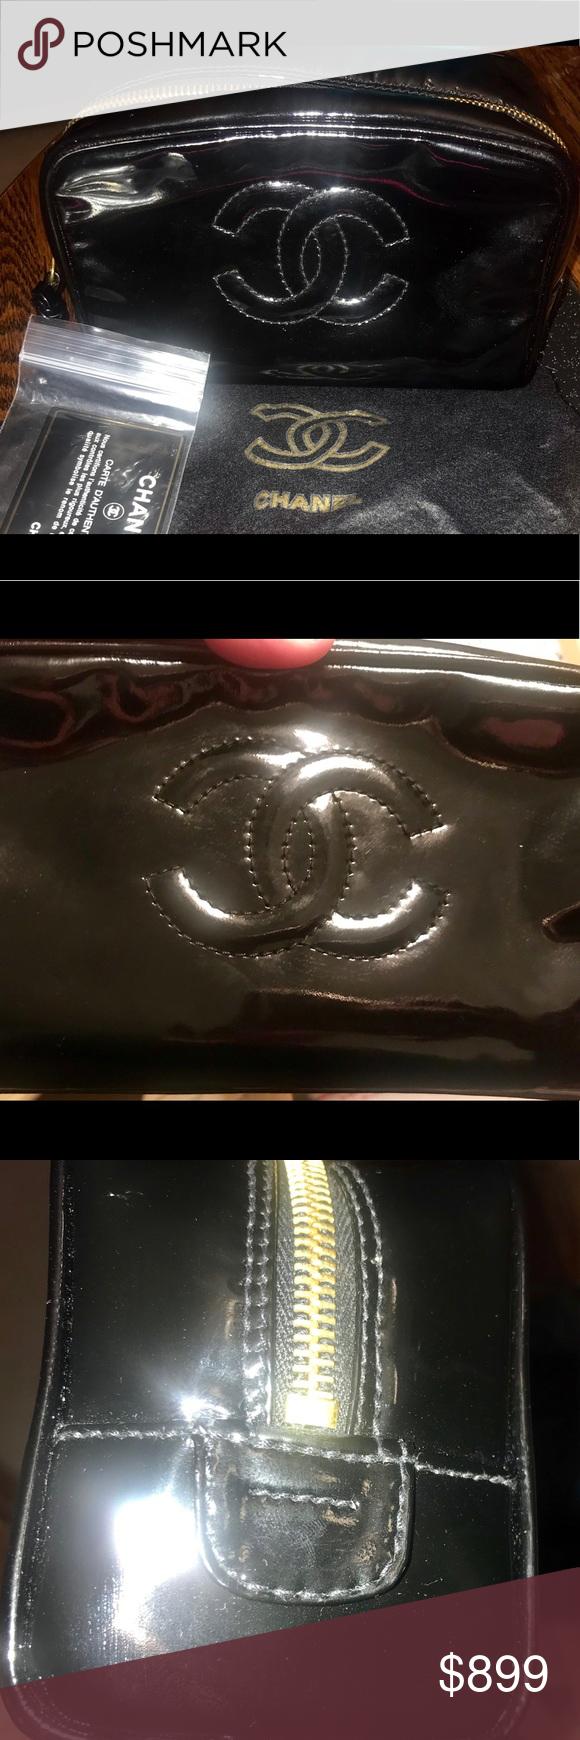 Chanel Vanity Makeup Bag BRAND NEW w/cover&card Makeup